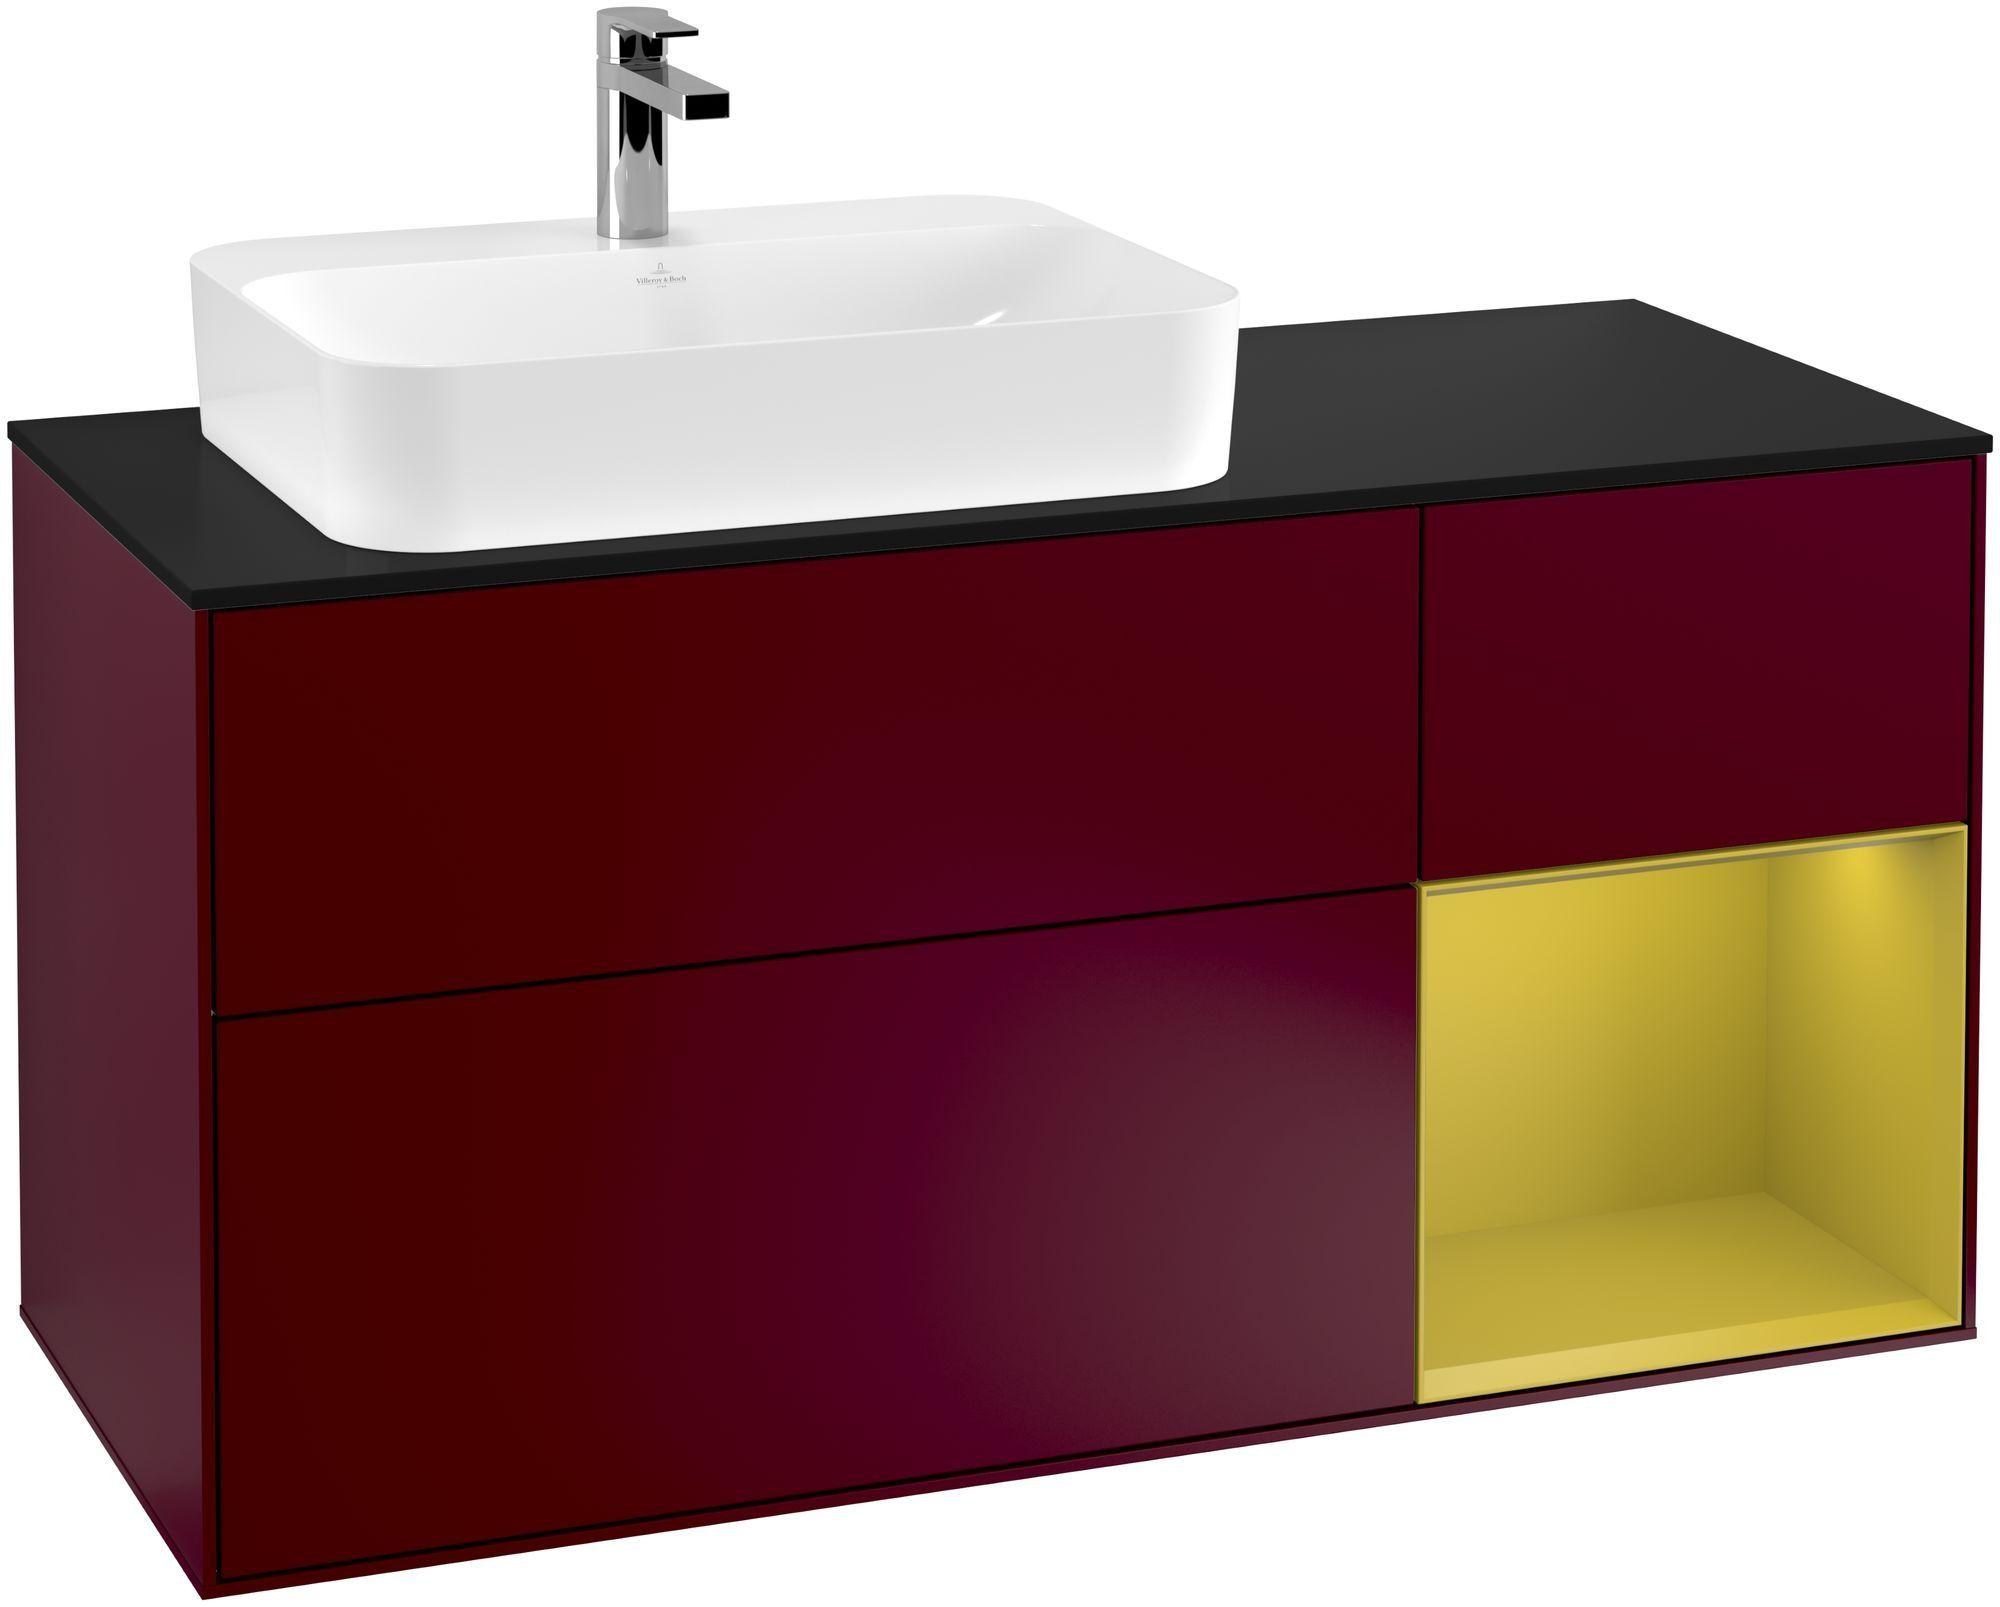 Villeroy & Boch Finion F40 Waschtischunterschrank mit Regalelement 3 Auszüge Waschtisch links LED-Beleuchtung B:120xH:60,3xT:50,1cm Front, Korpus: Peony, Regal: Sun, Glasplatte: Black Matt F402HEHB